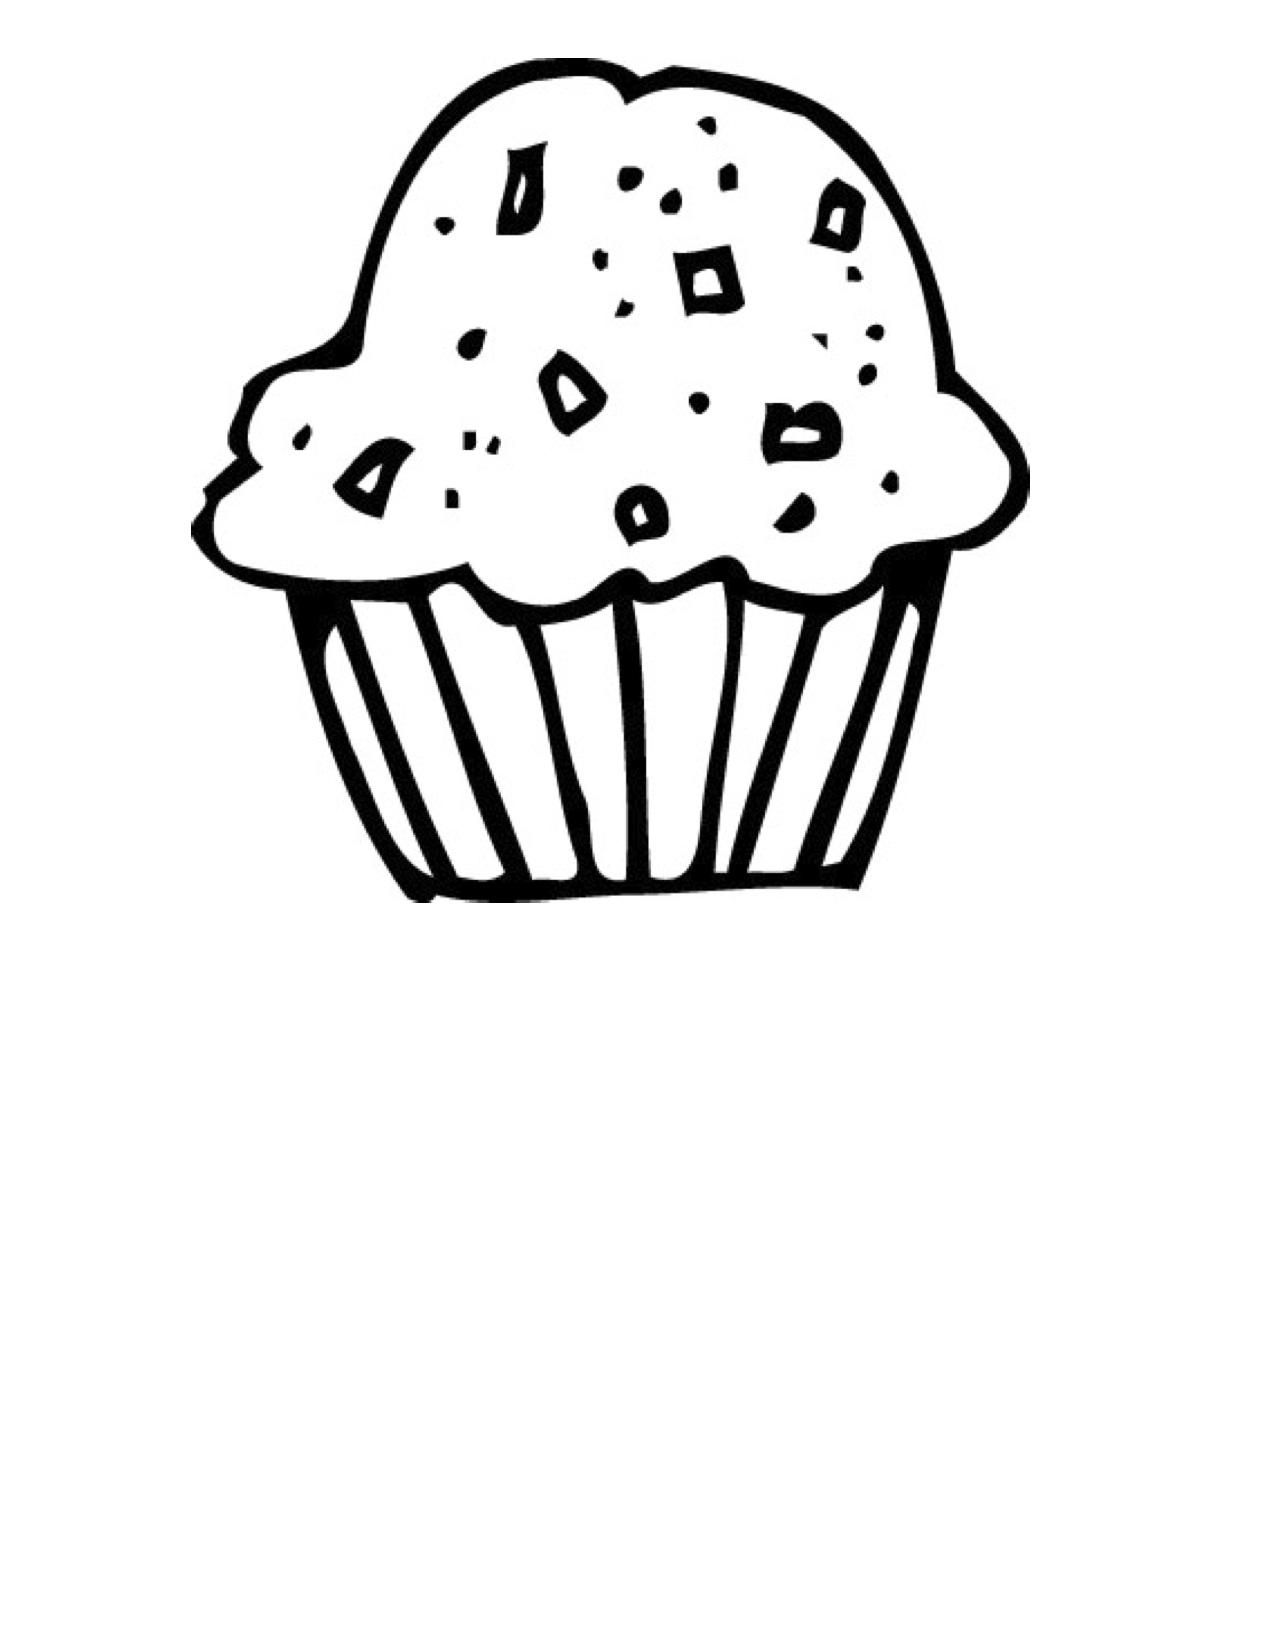 Black and white muffin clipart clip art black and white library Muffin clipart black and white 3 » Clipart Station clip art black and white library